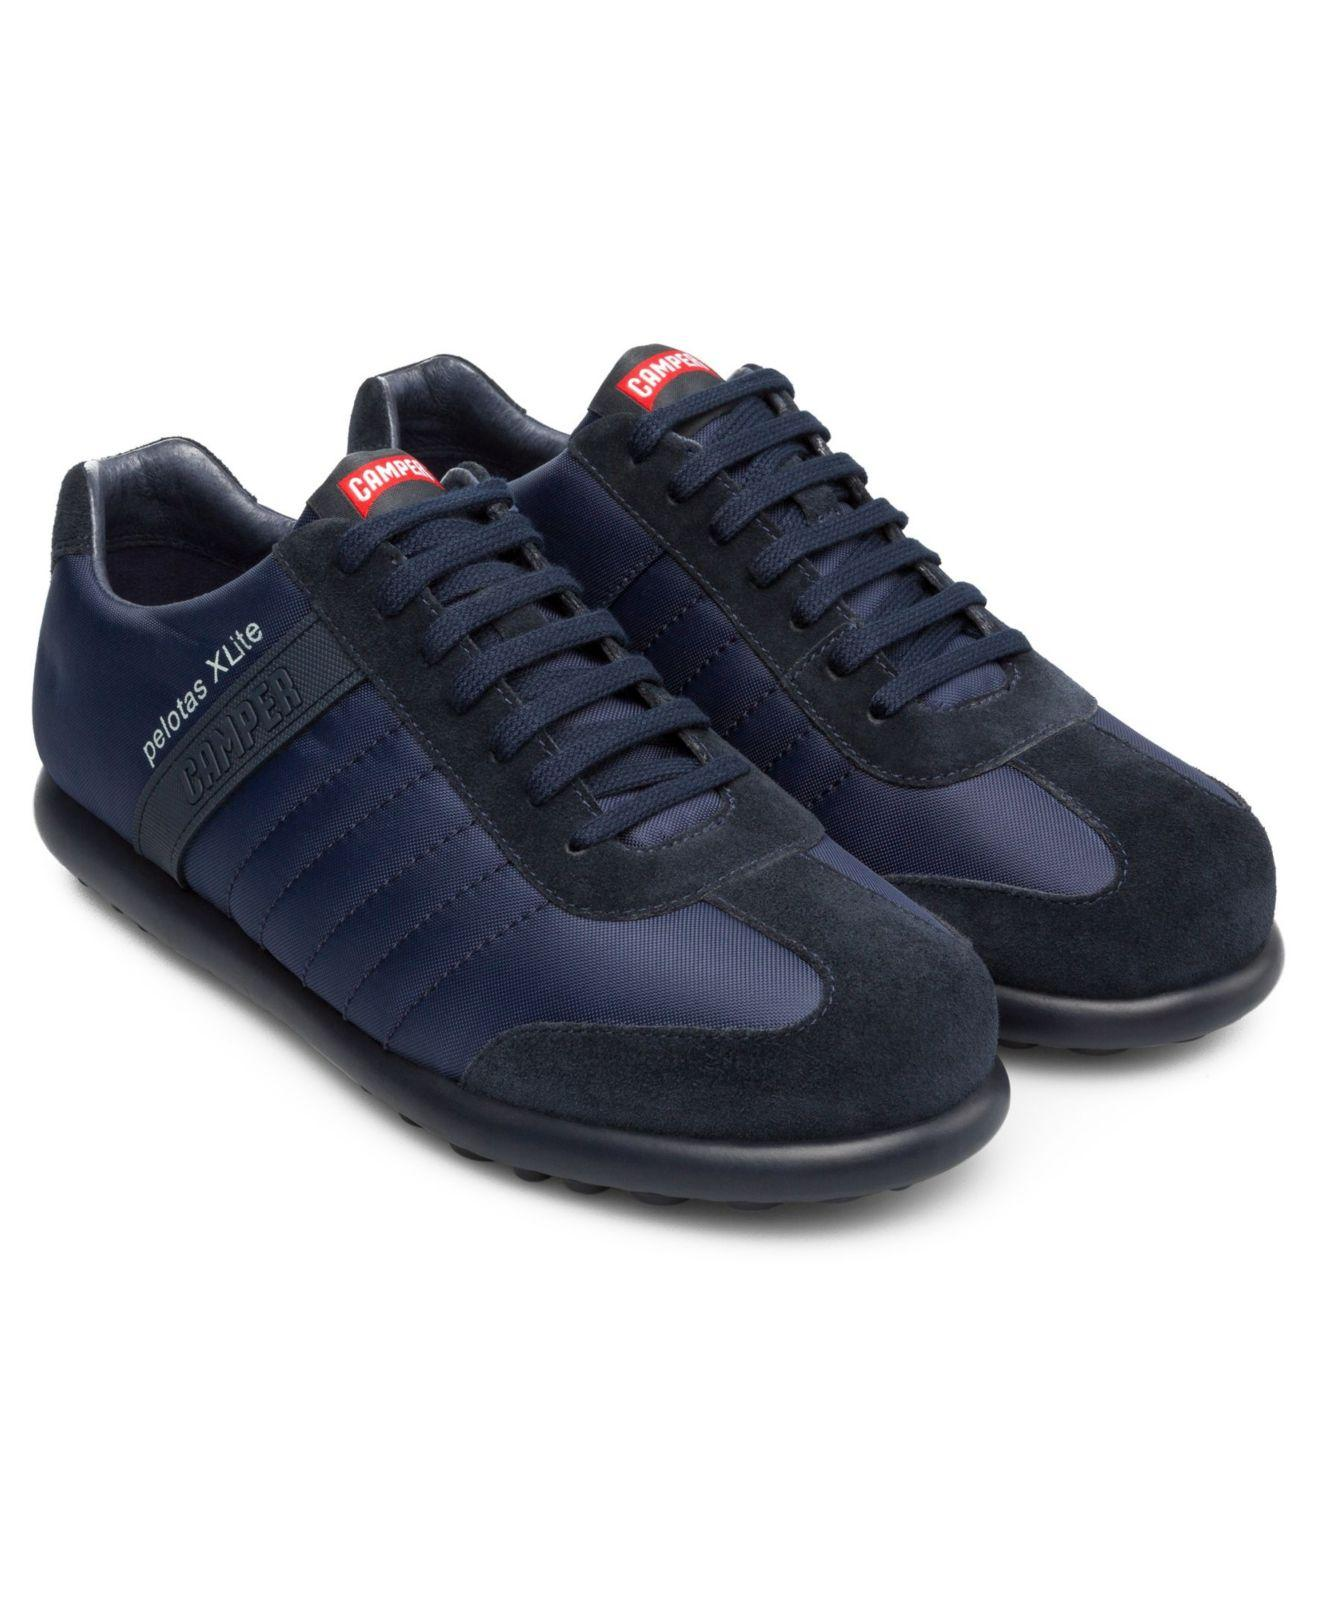 Camper Pelotas Xl Sneakers in Navy (Blue) for Men Save 33